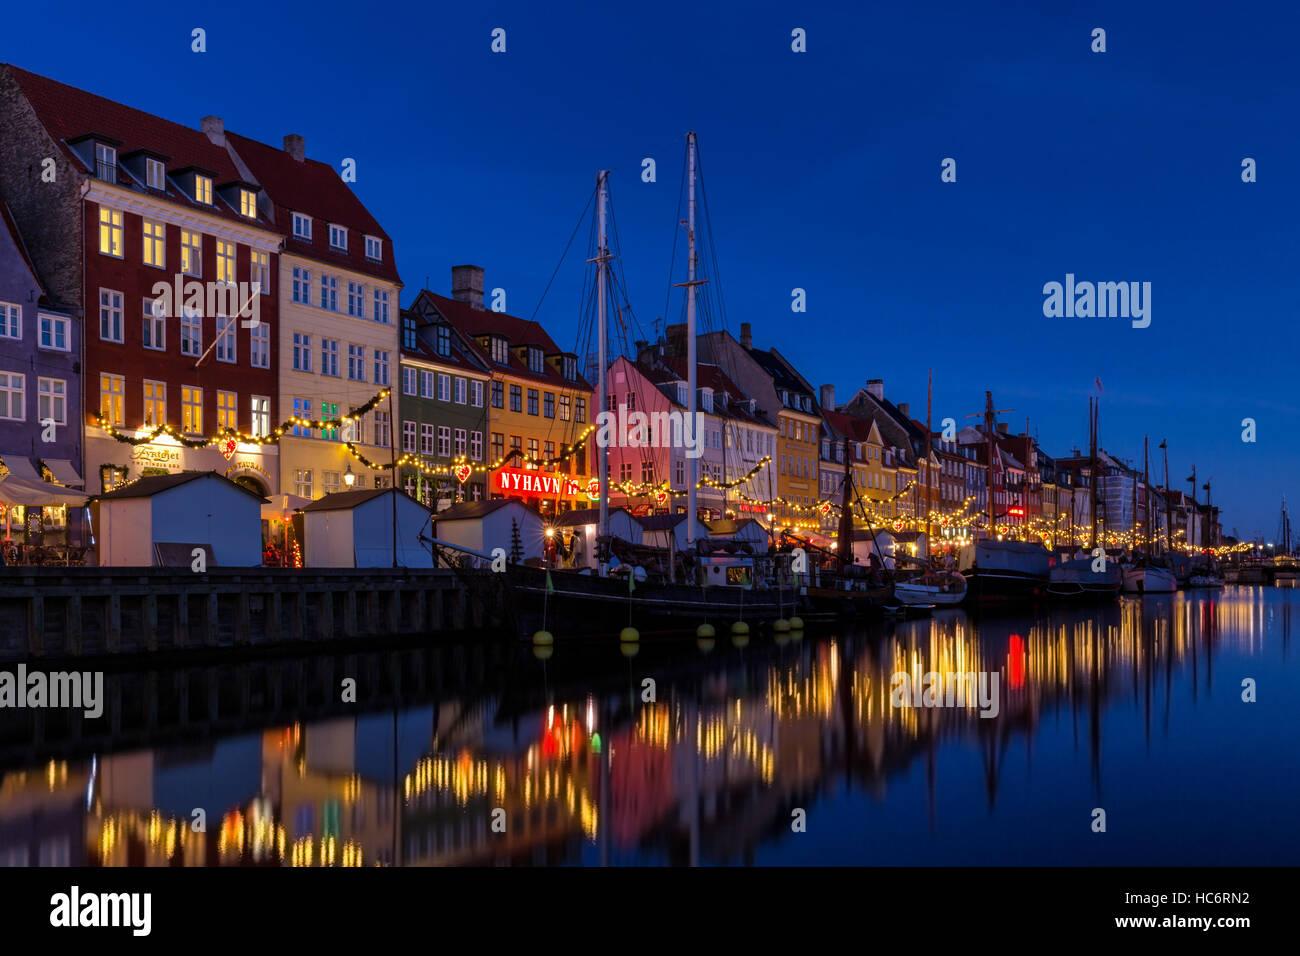 Christmas decoration along Nyhavn canal, Copenhagen, Denmark - Stock Image